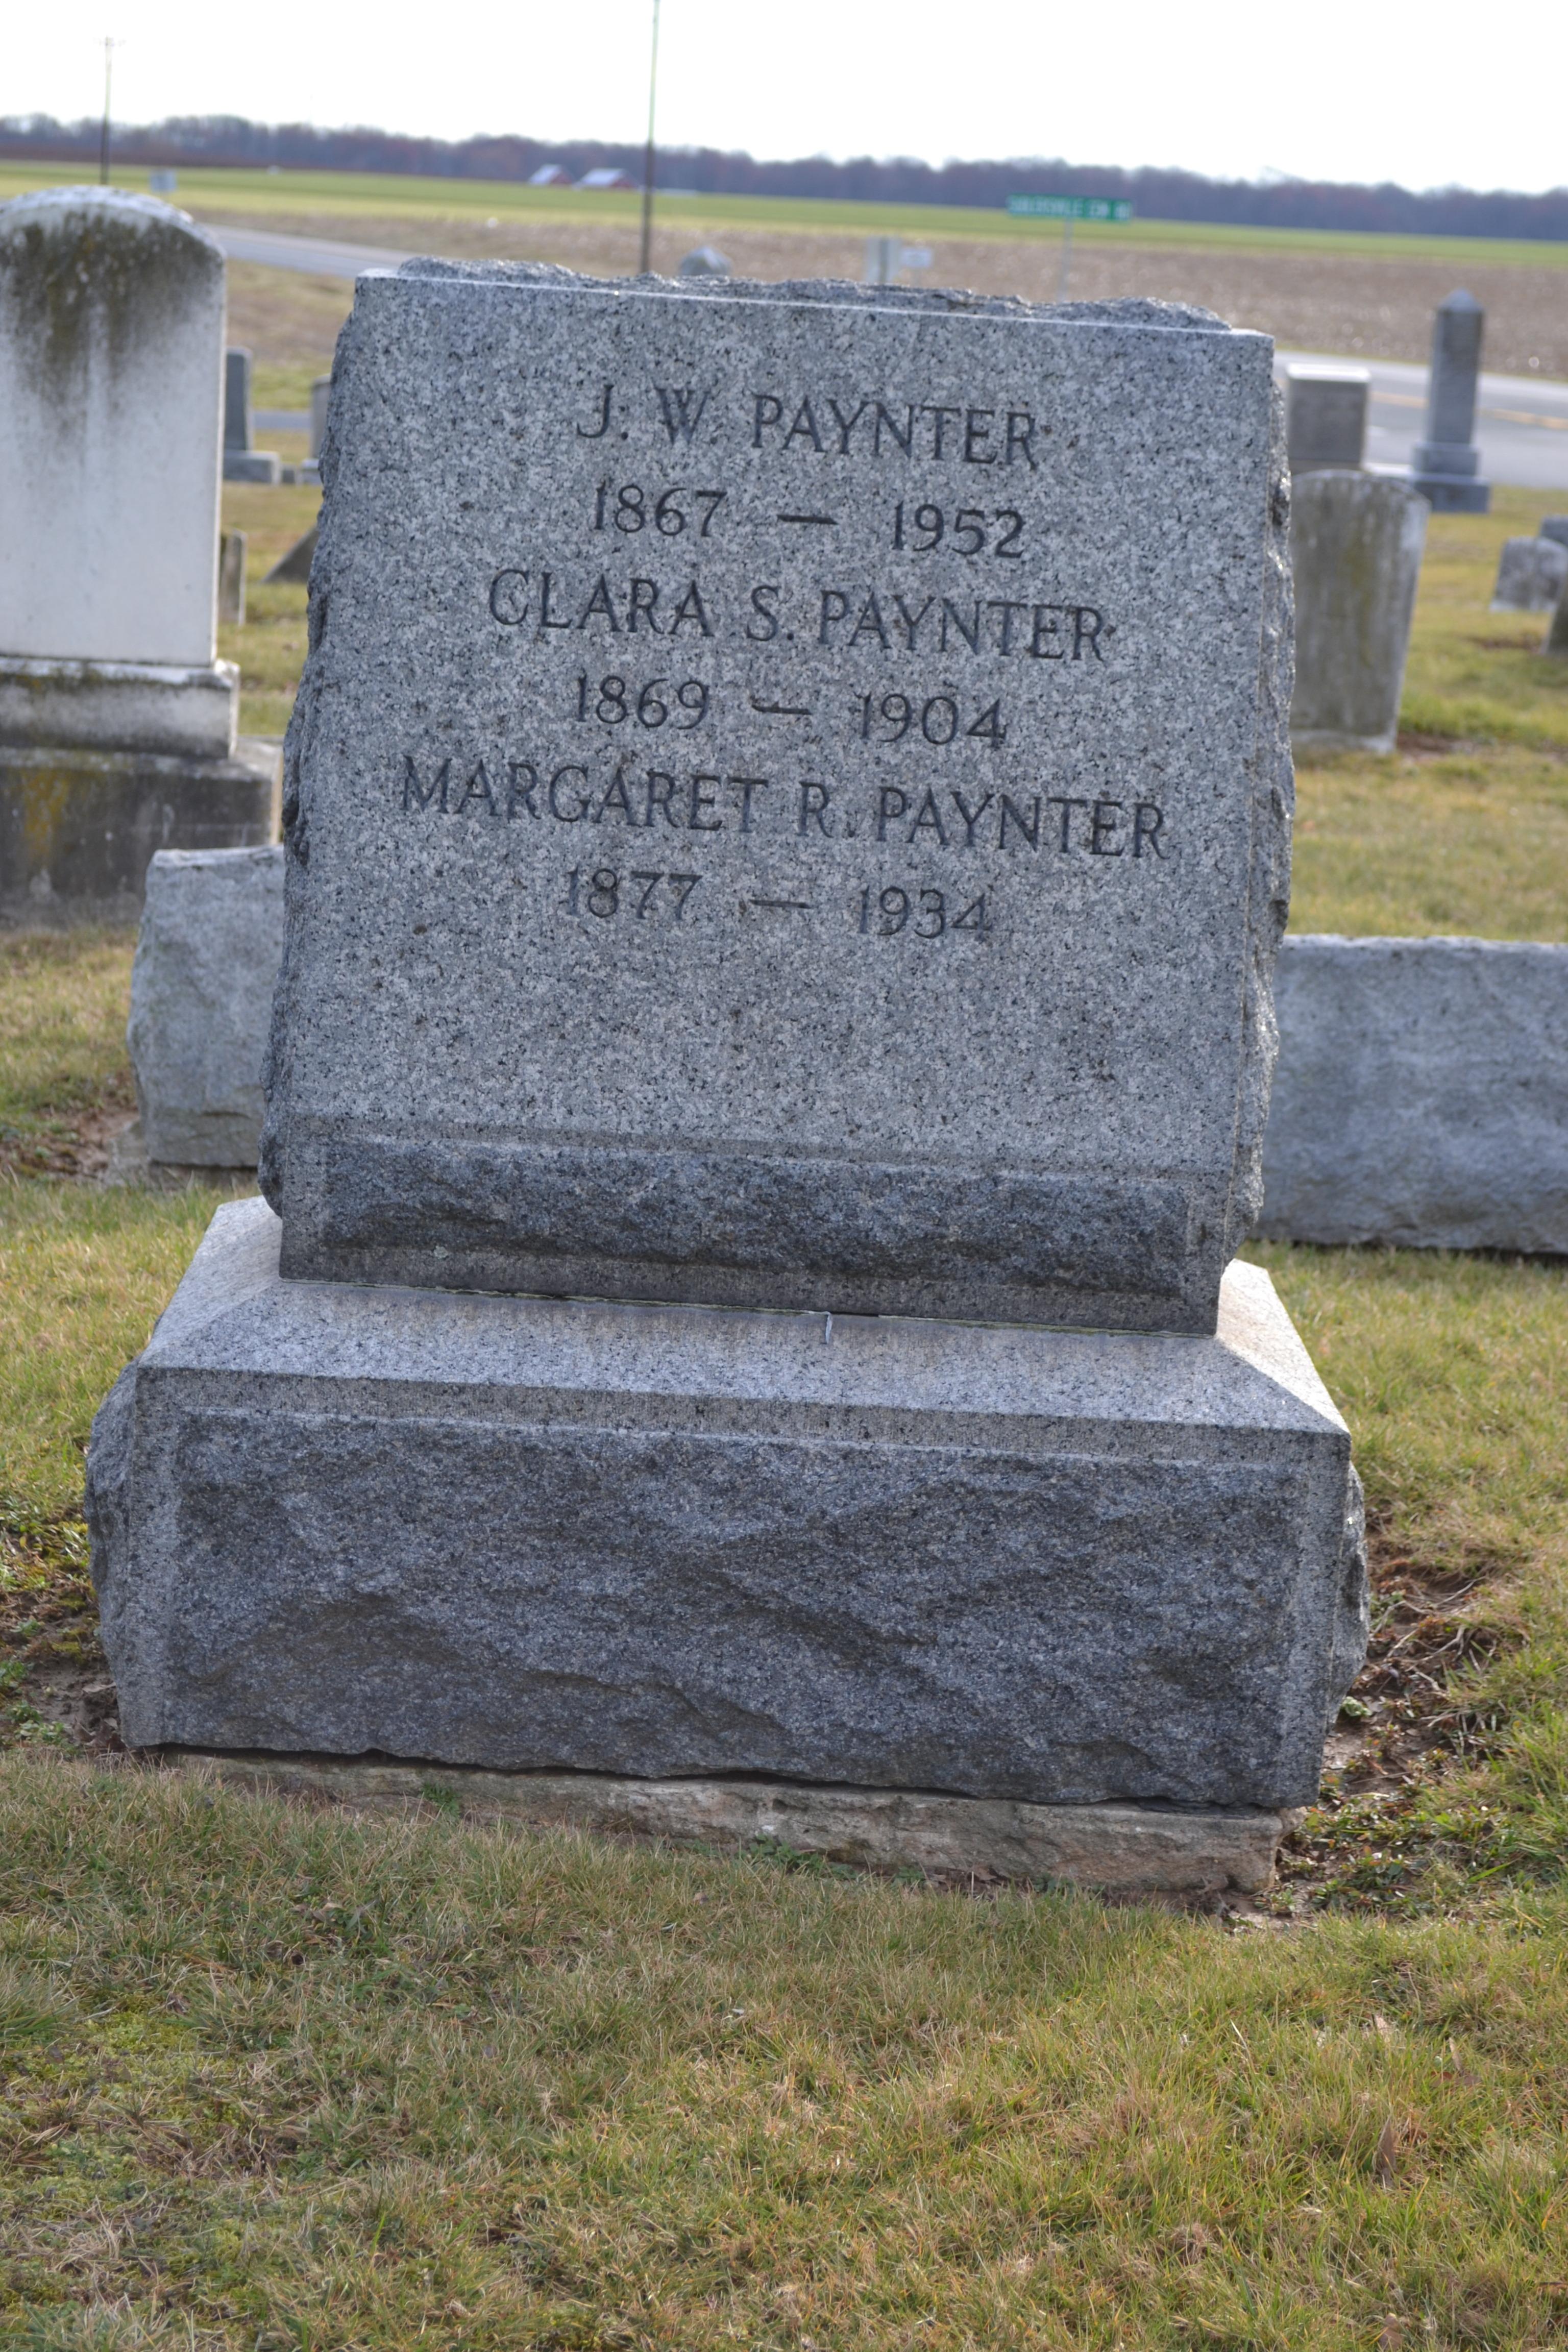 J W Paynter